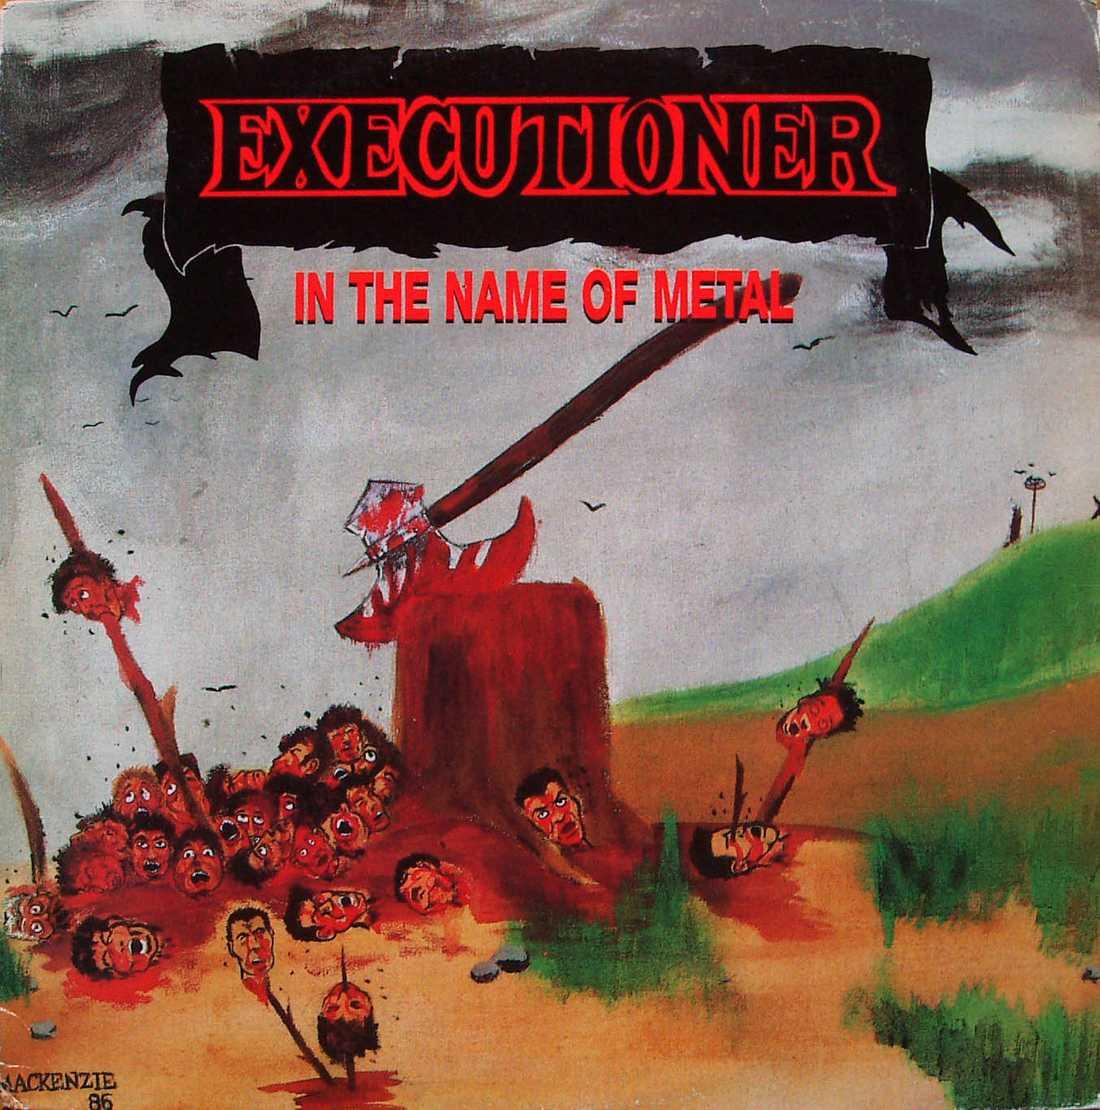 Excutioner - In The Name Of Metal  I metallens namn huggs huvuden av som om de vore limpskivor.